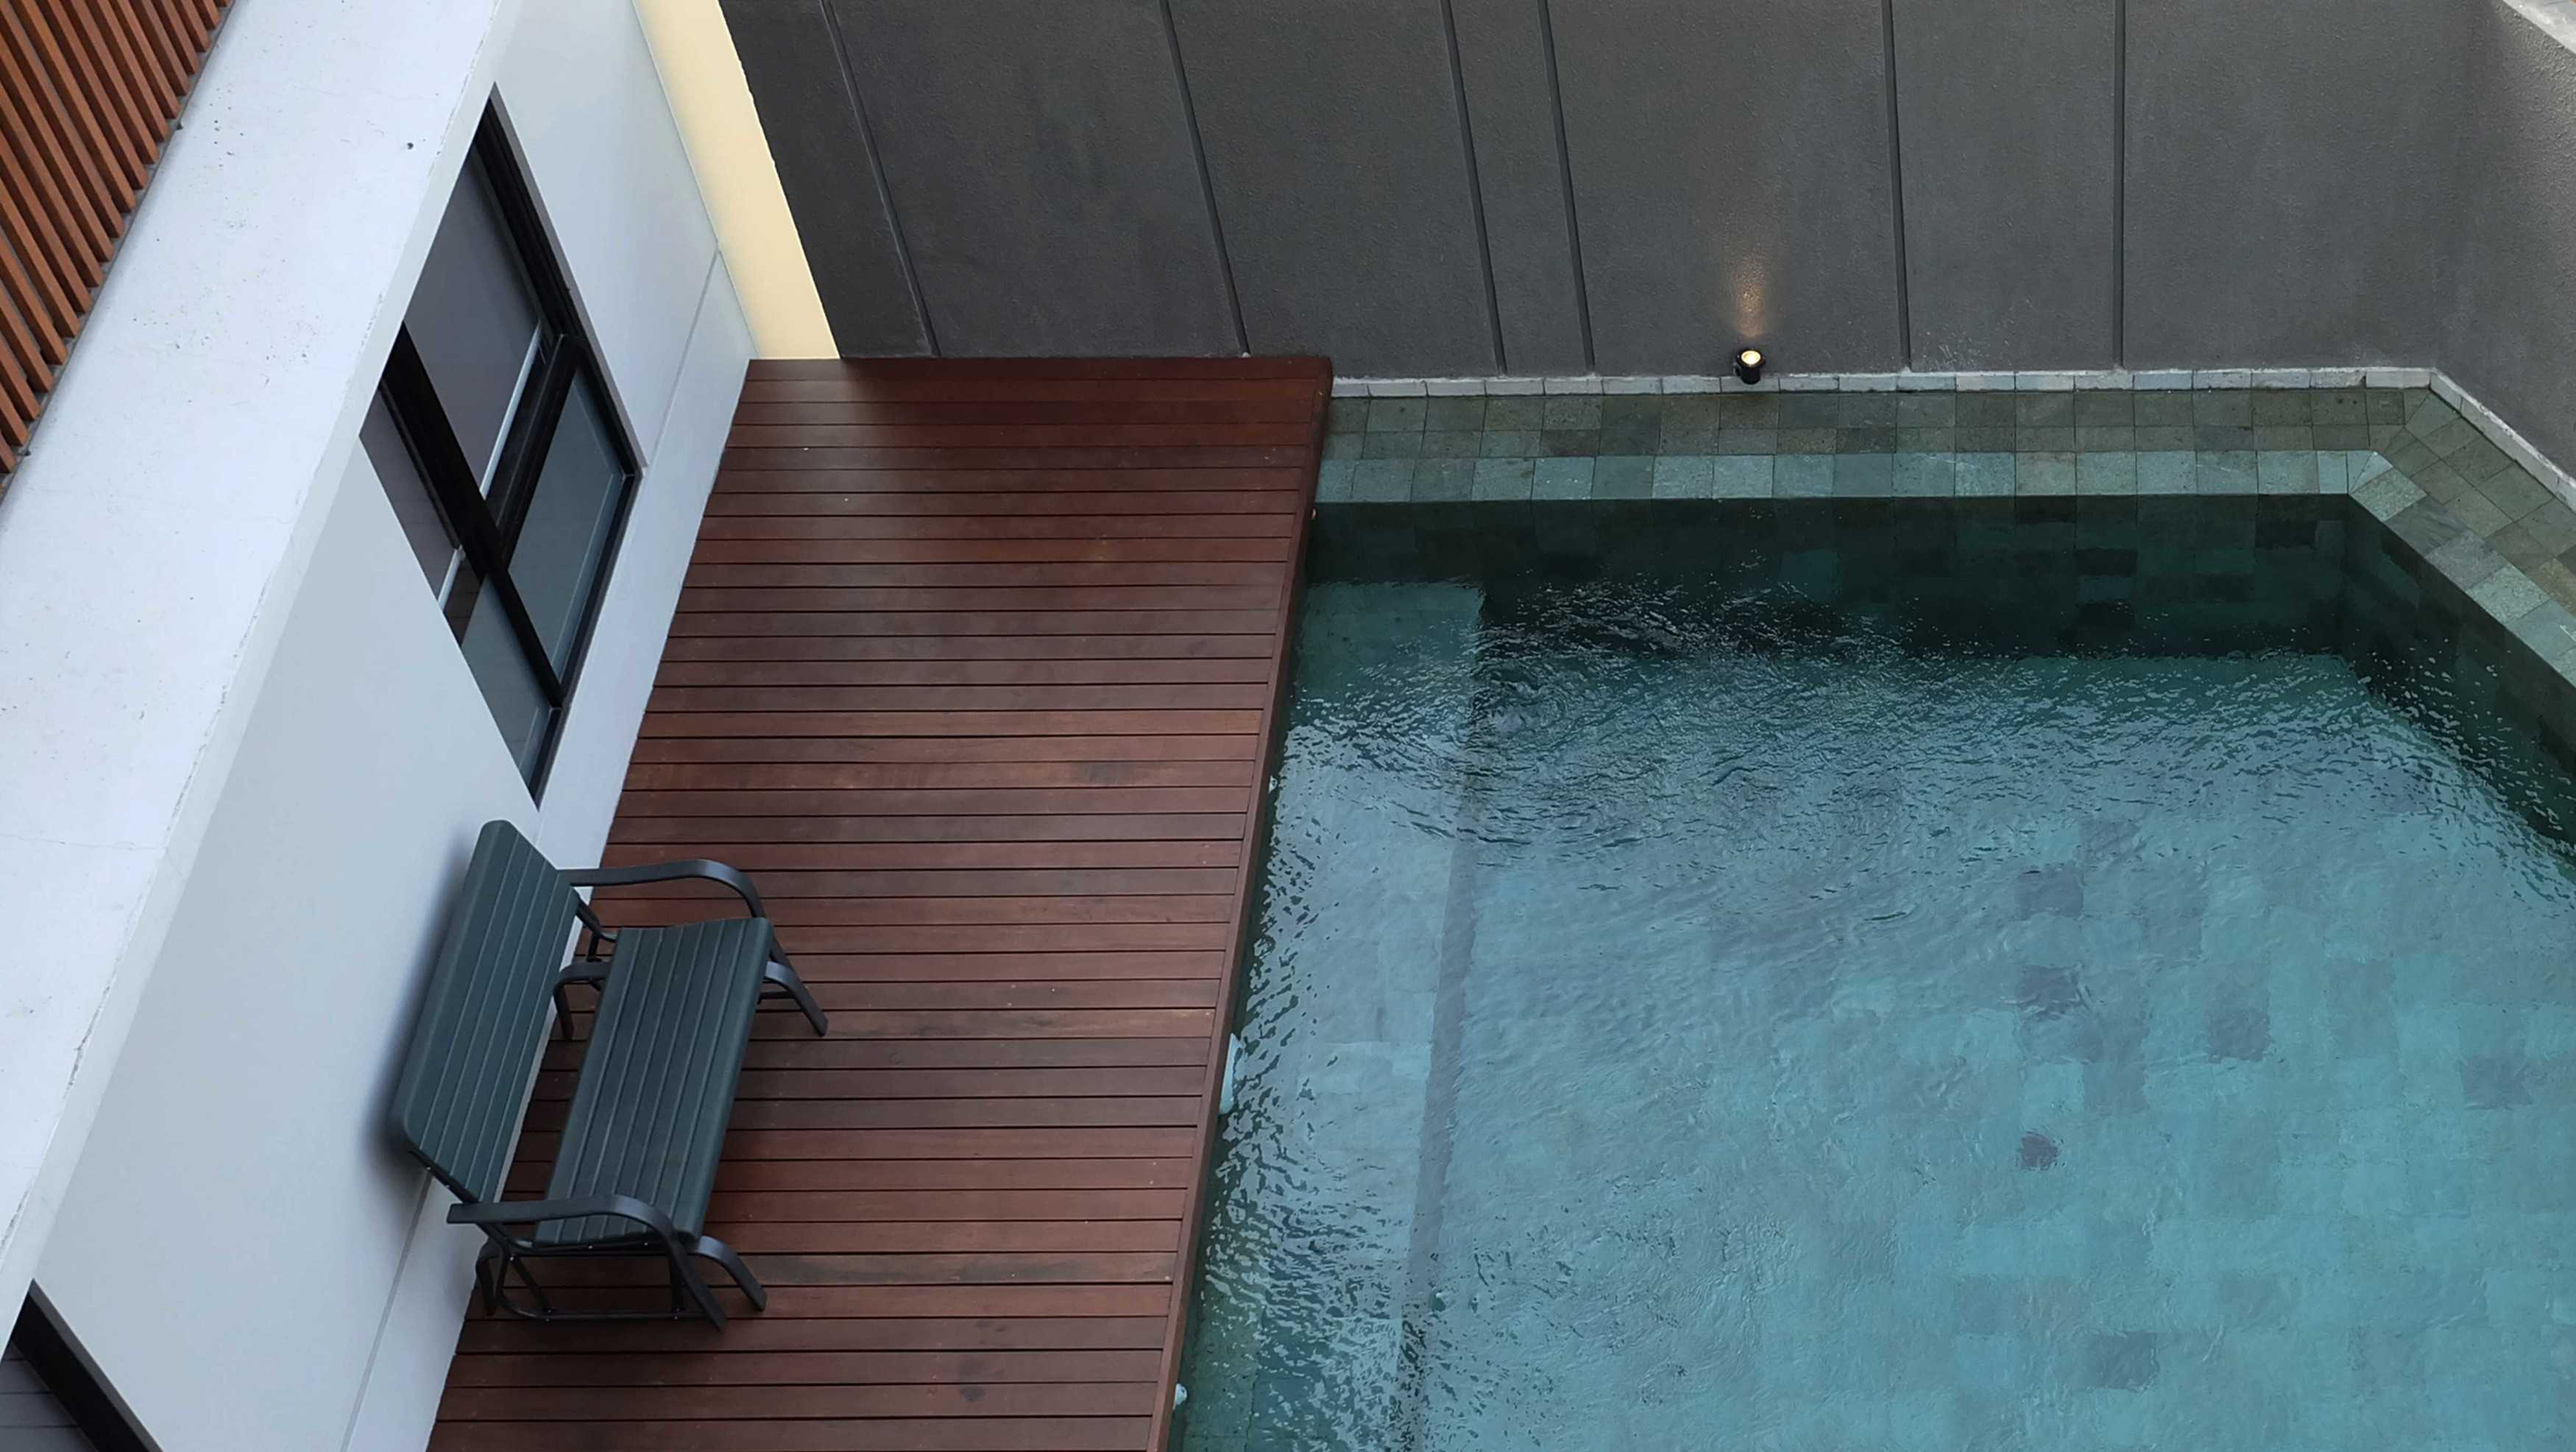 Gohte Architects Vk Homes Lippo Karawaci, Binong, Kec. Curug, Tangerang, Banten, Indonesia Lippo Karawaci, Binong, Kec. Curug, Tangerang, Banten, Indonesia Gohte-Architects-Vk-Homes   96620